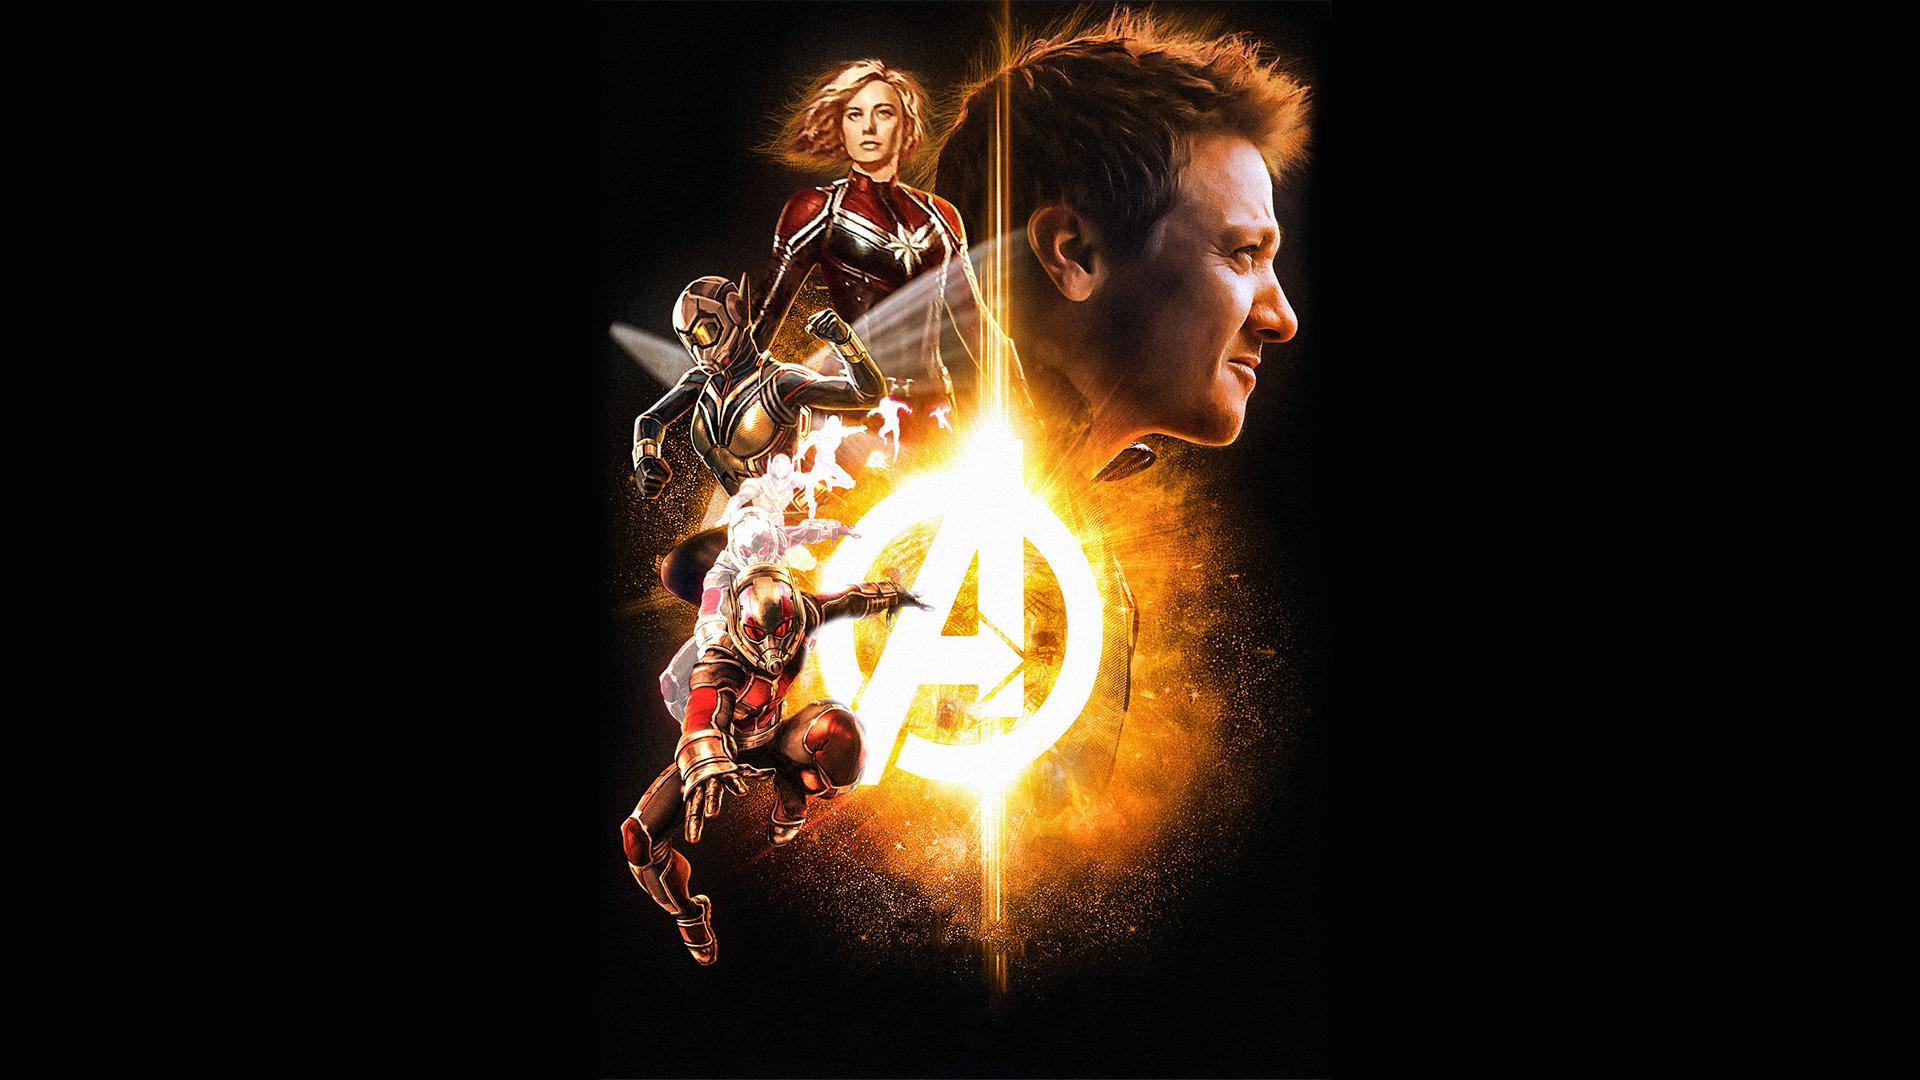 Avengers Infinity War 2018 Soul Stone Poster Hd Movies 4k